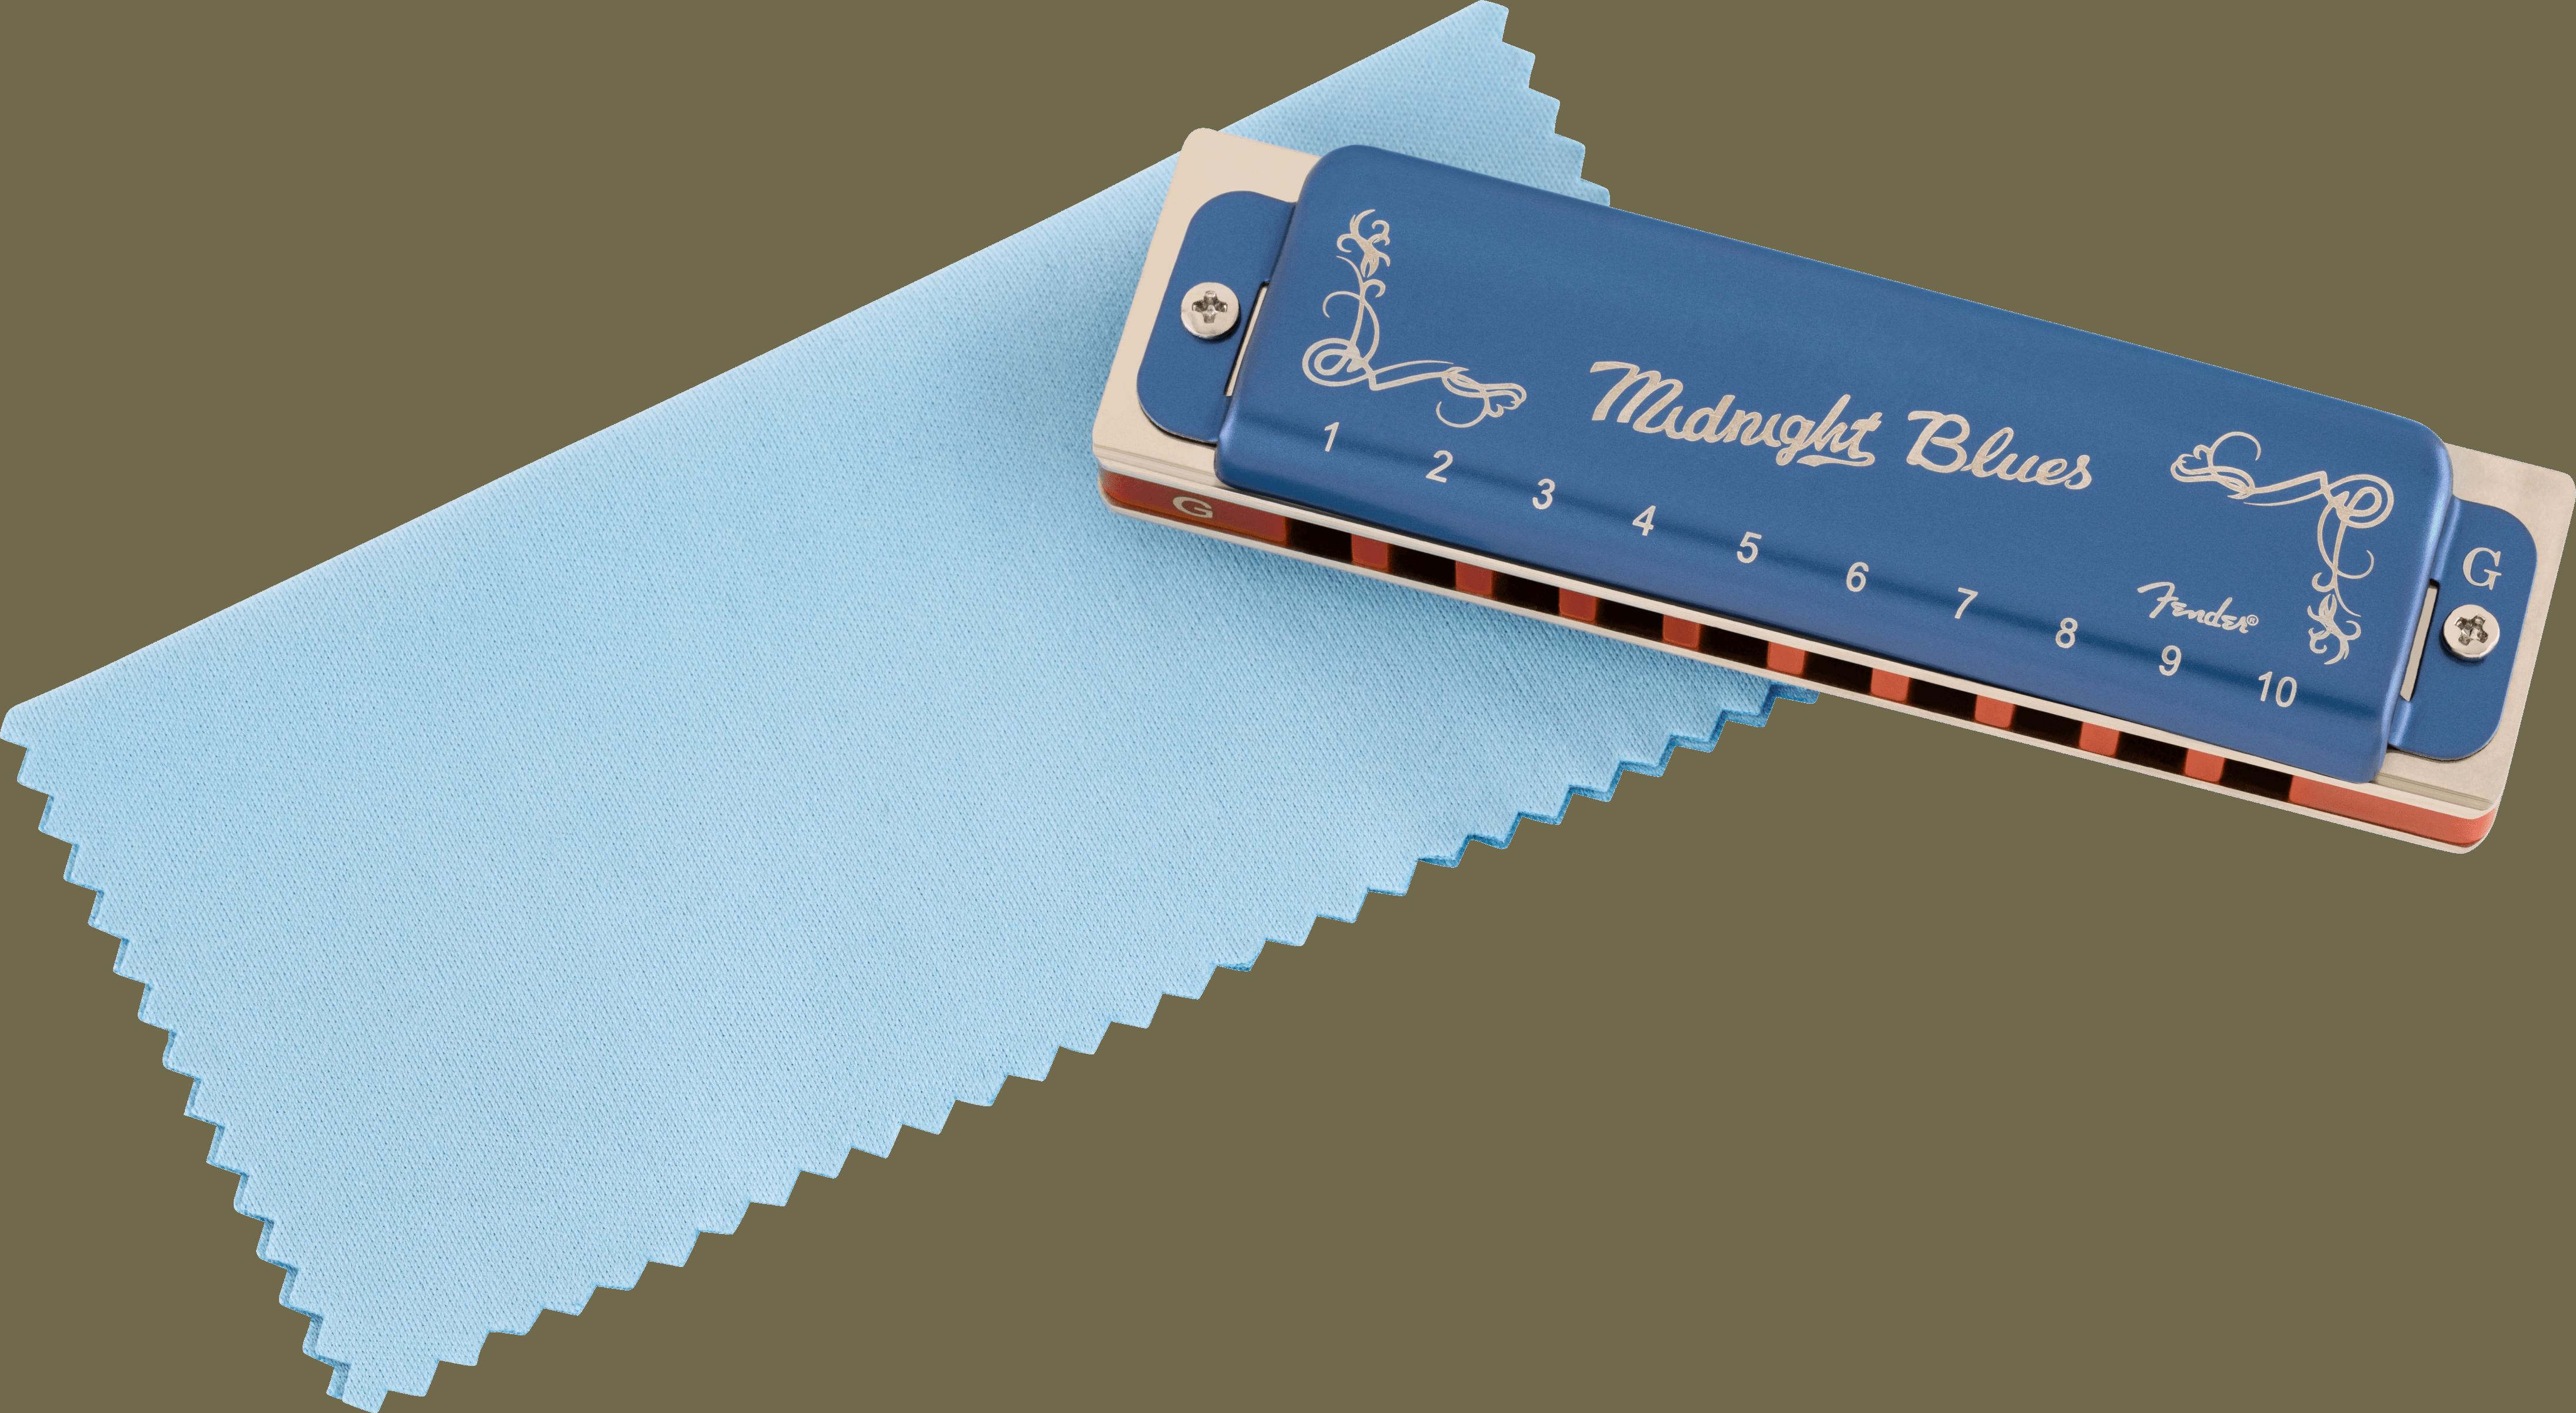 FENDER-Midnight-Blues-Harmonica-Key-of-G-0990702102-sku-550022831